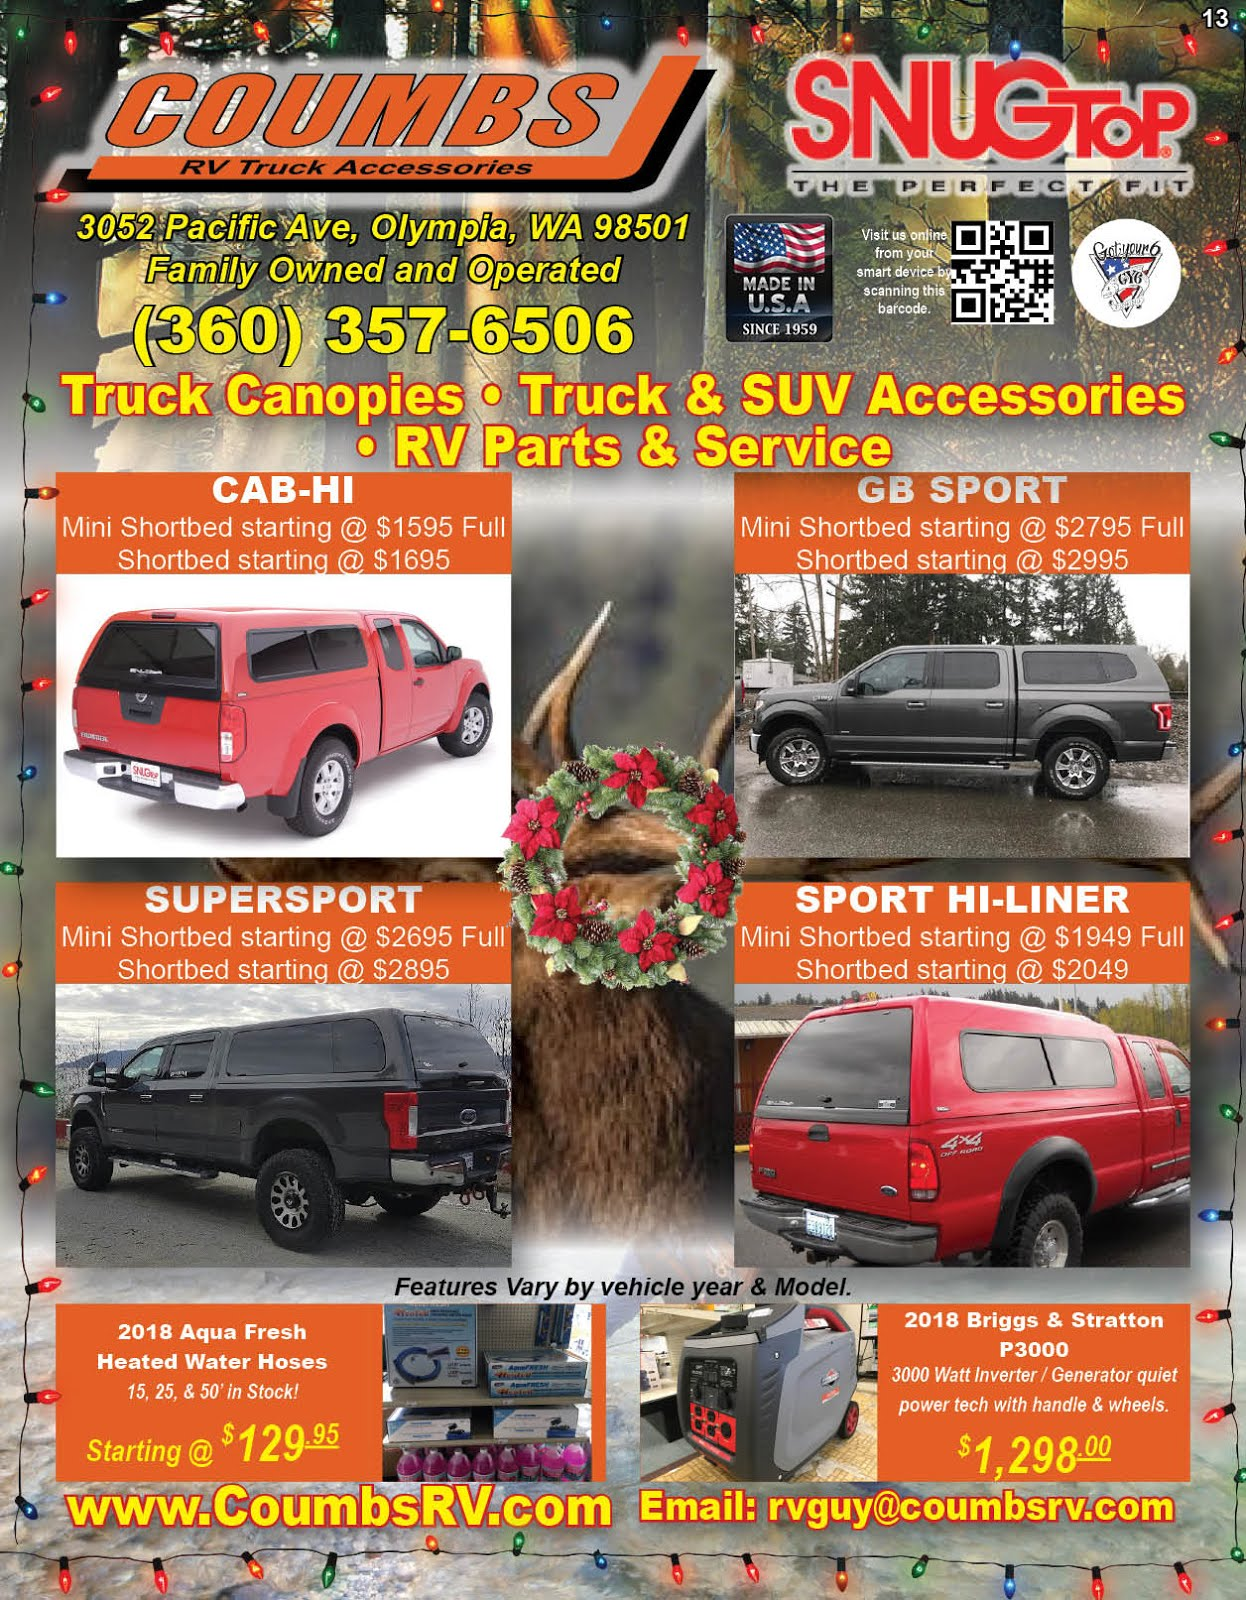 Coumbs RV & Truck Accessories